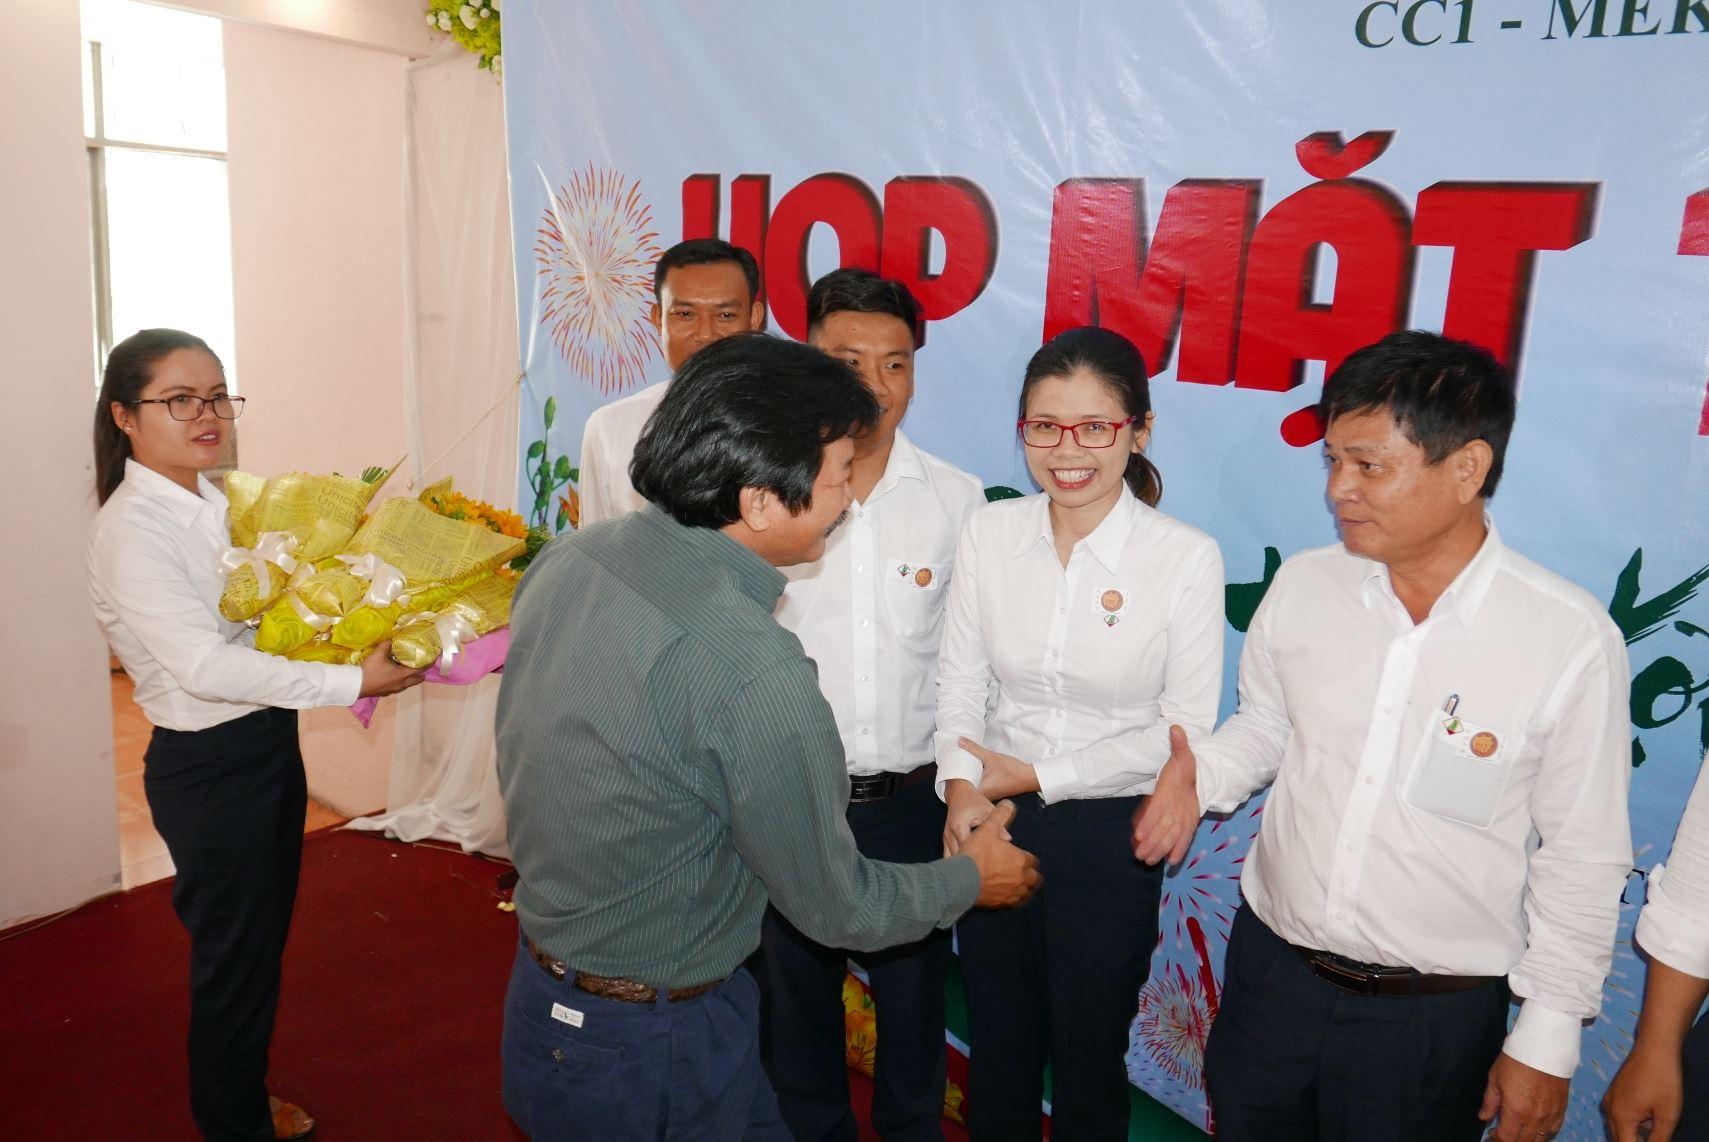 tat-nien-2019-cc1-mekong (12)